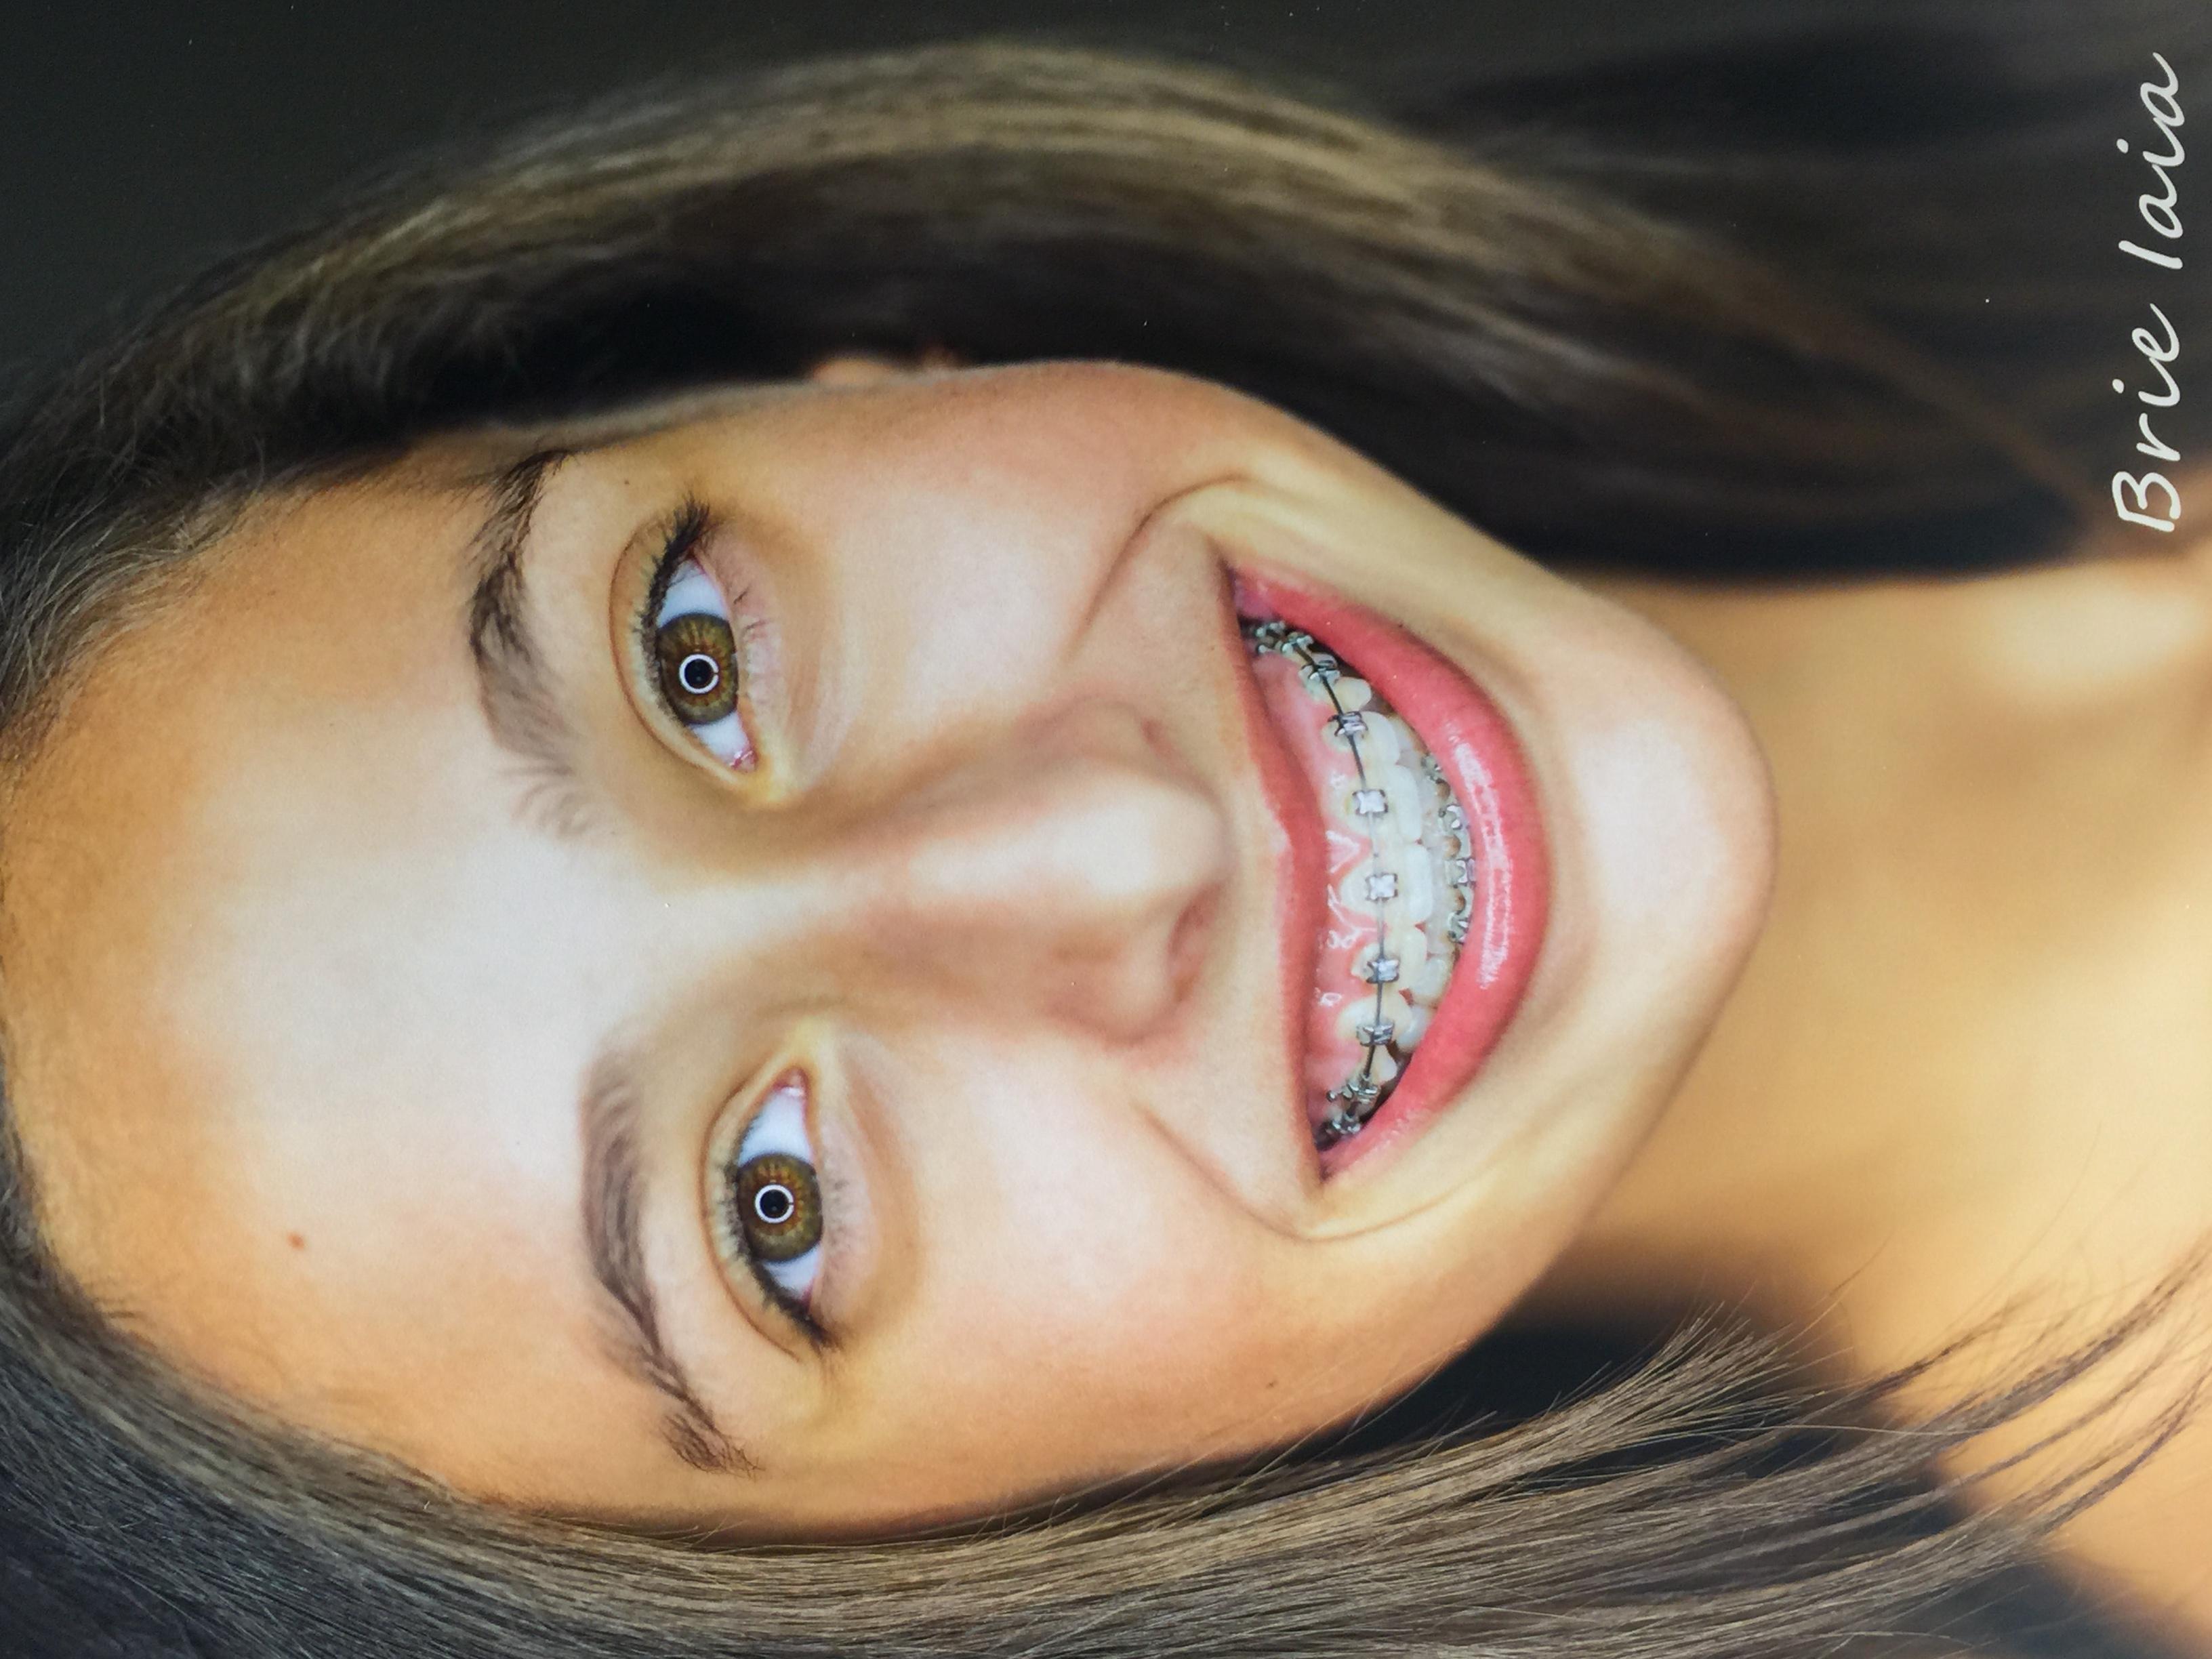 Brie Laia